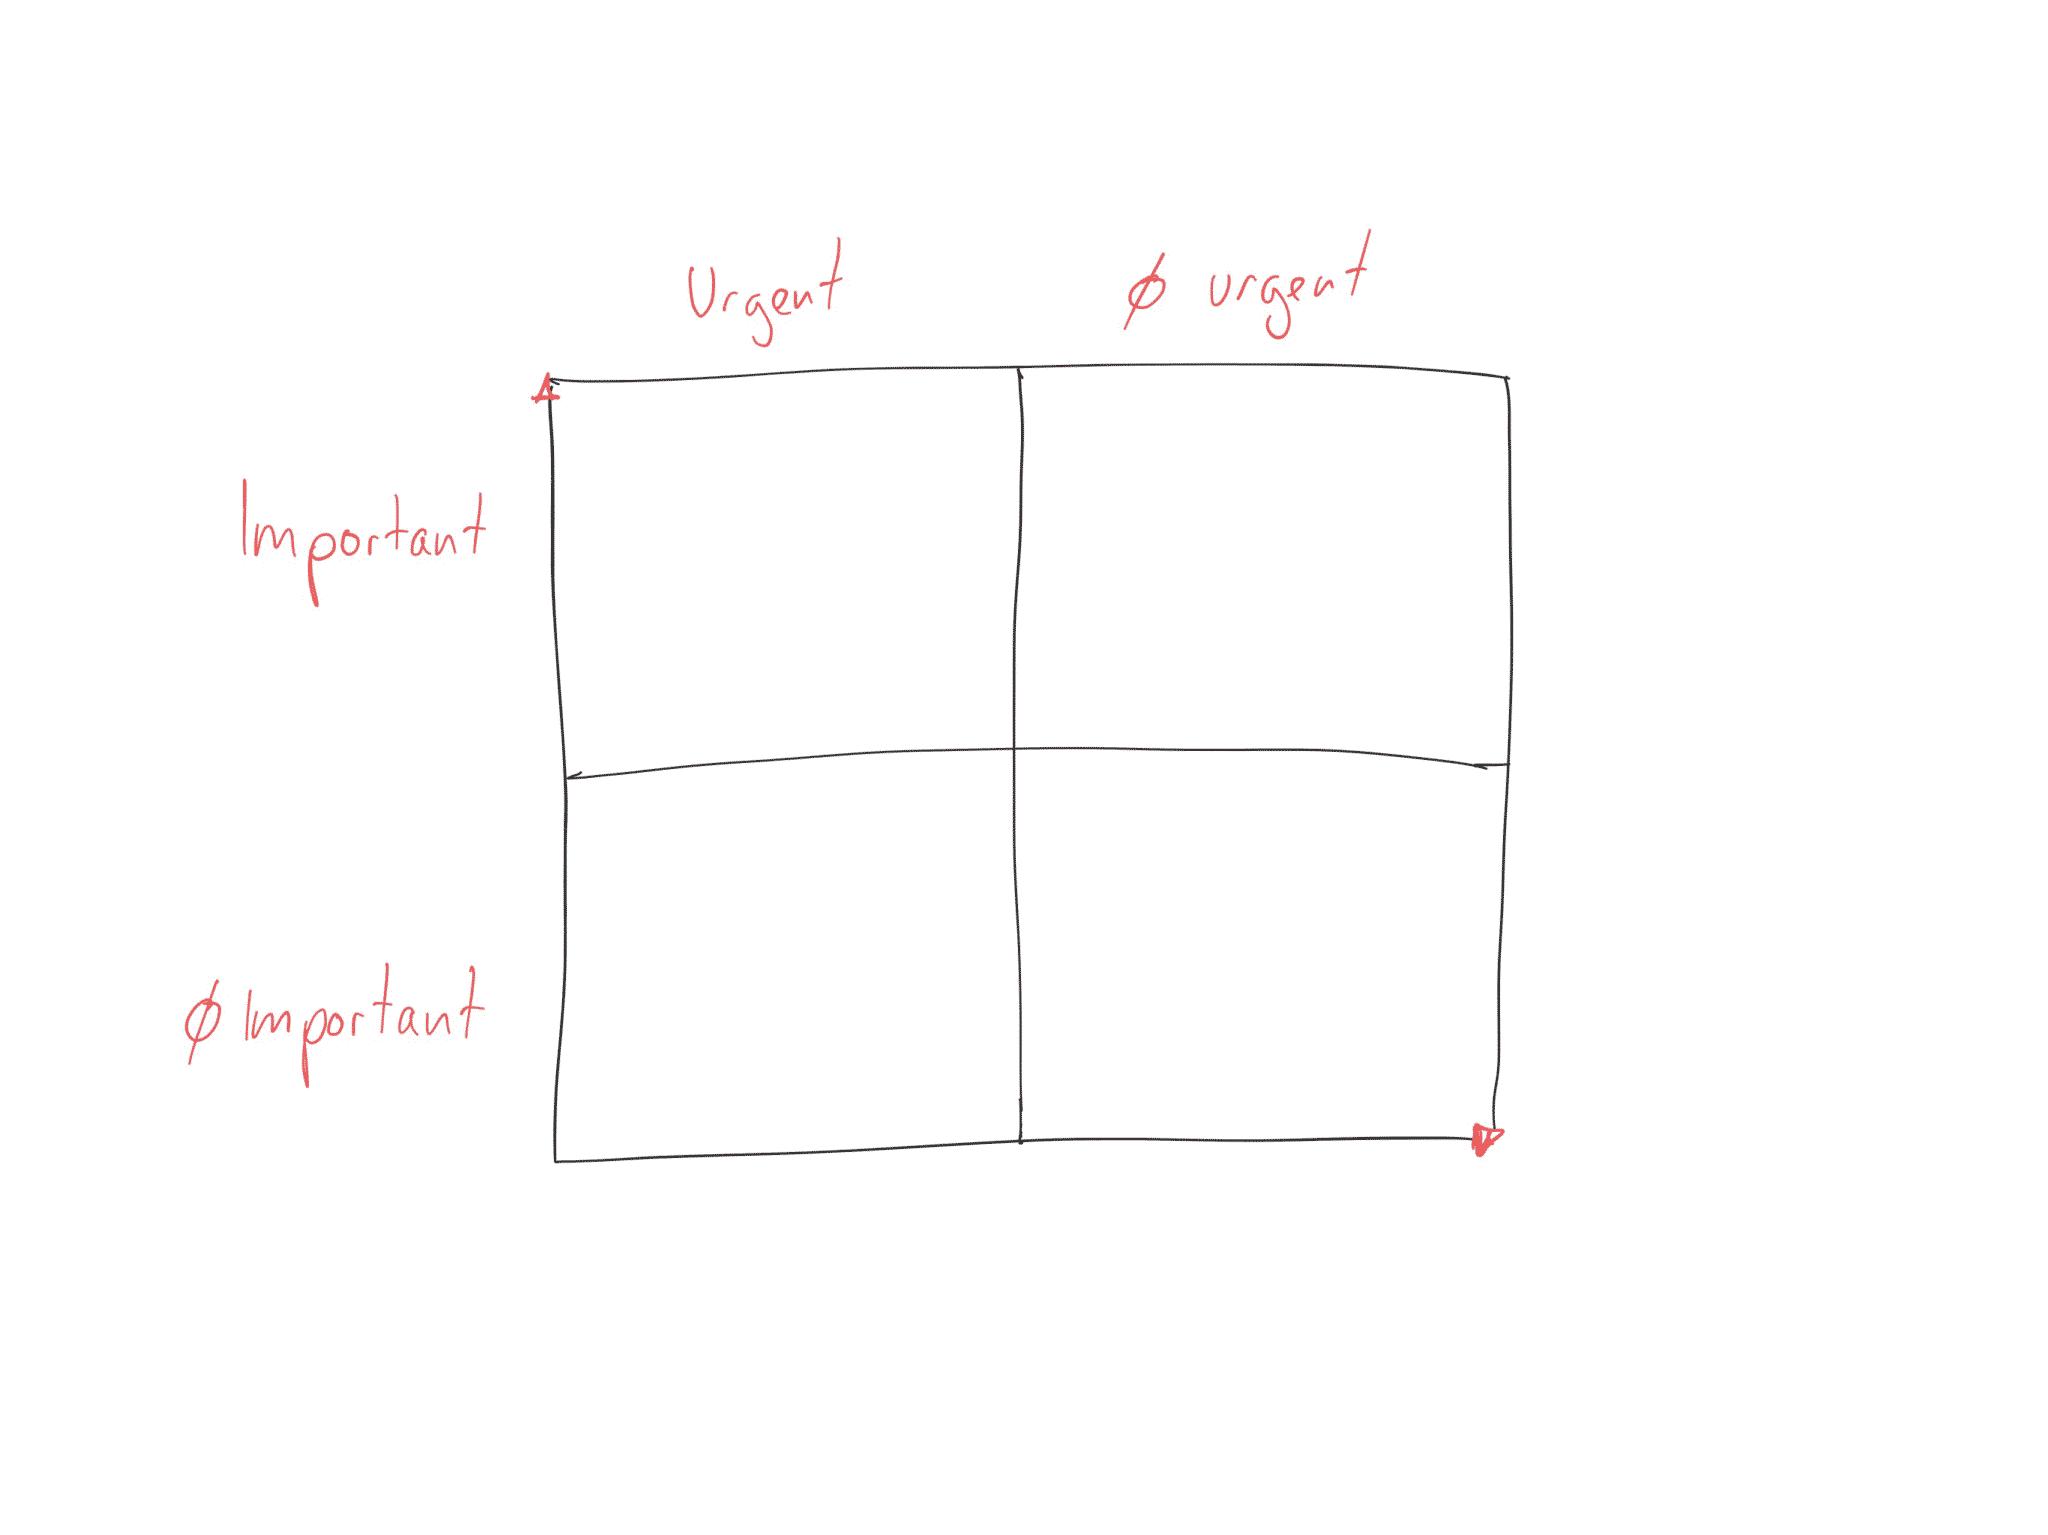 La matrice d'eisenhower